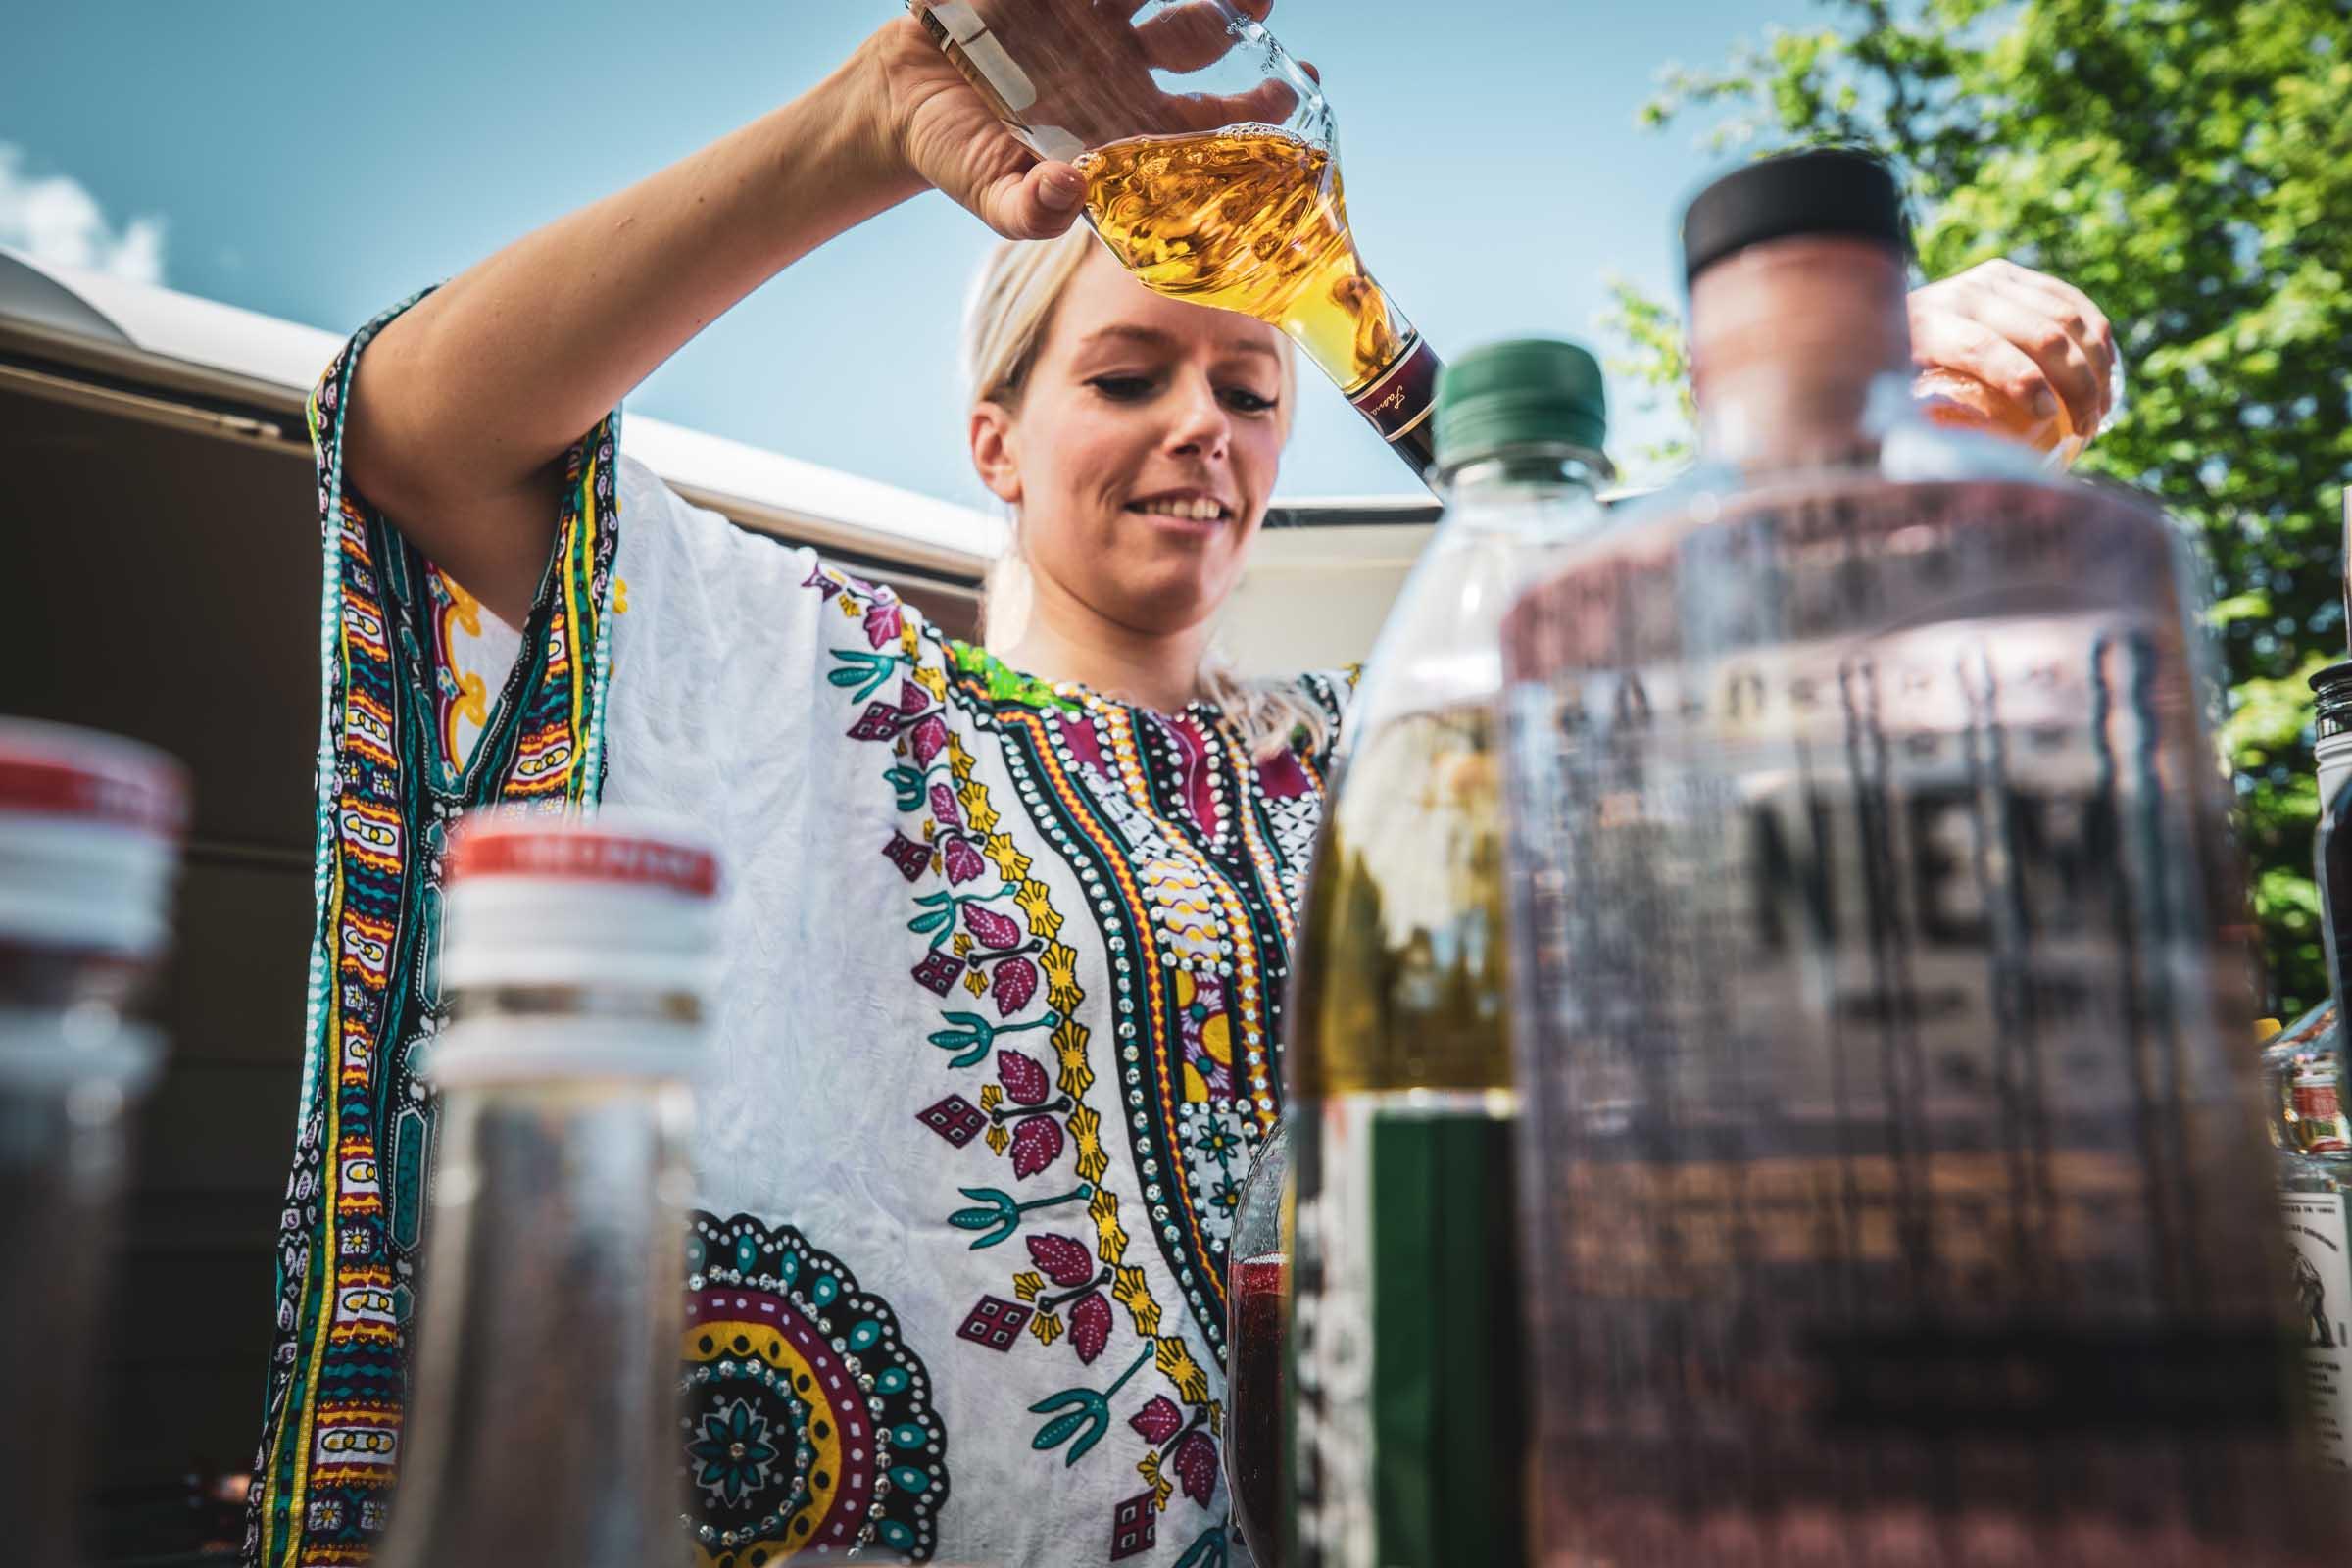 Barformat | Mobile | Bar | Cocktailservice | Hannover | Getränke | Catering | Cocktails | Wein | Aperitif | Hochzeit | Trauung | Sektempfang | Softdrinks | Messe | Firmenfeier | Buchen | Mieten | Anfragen